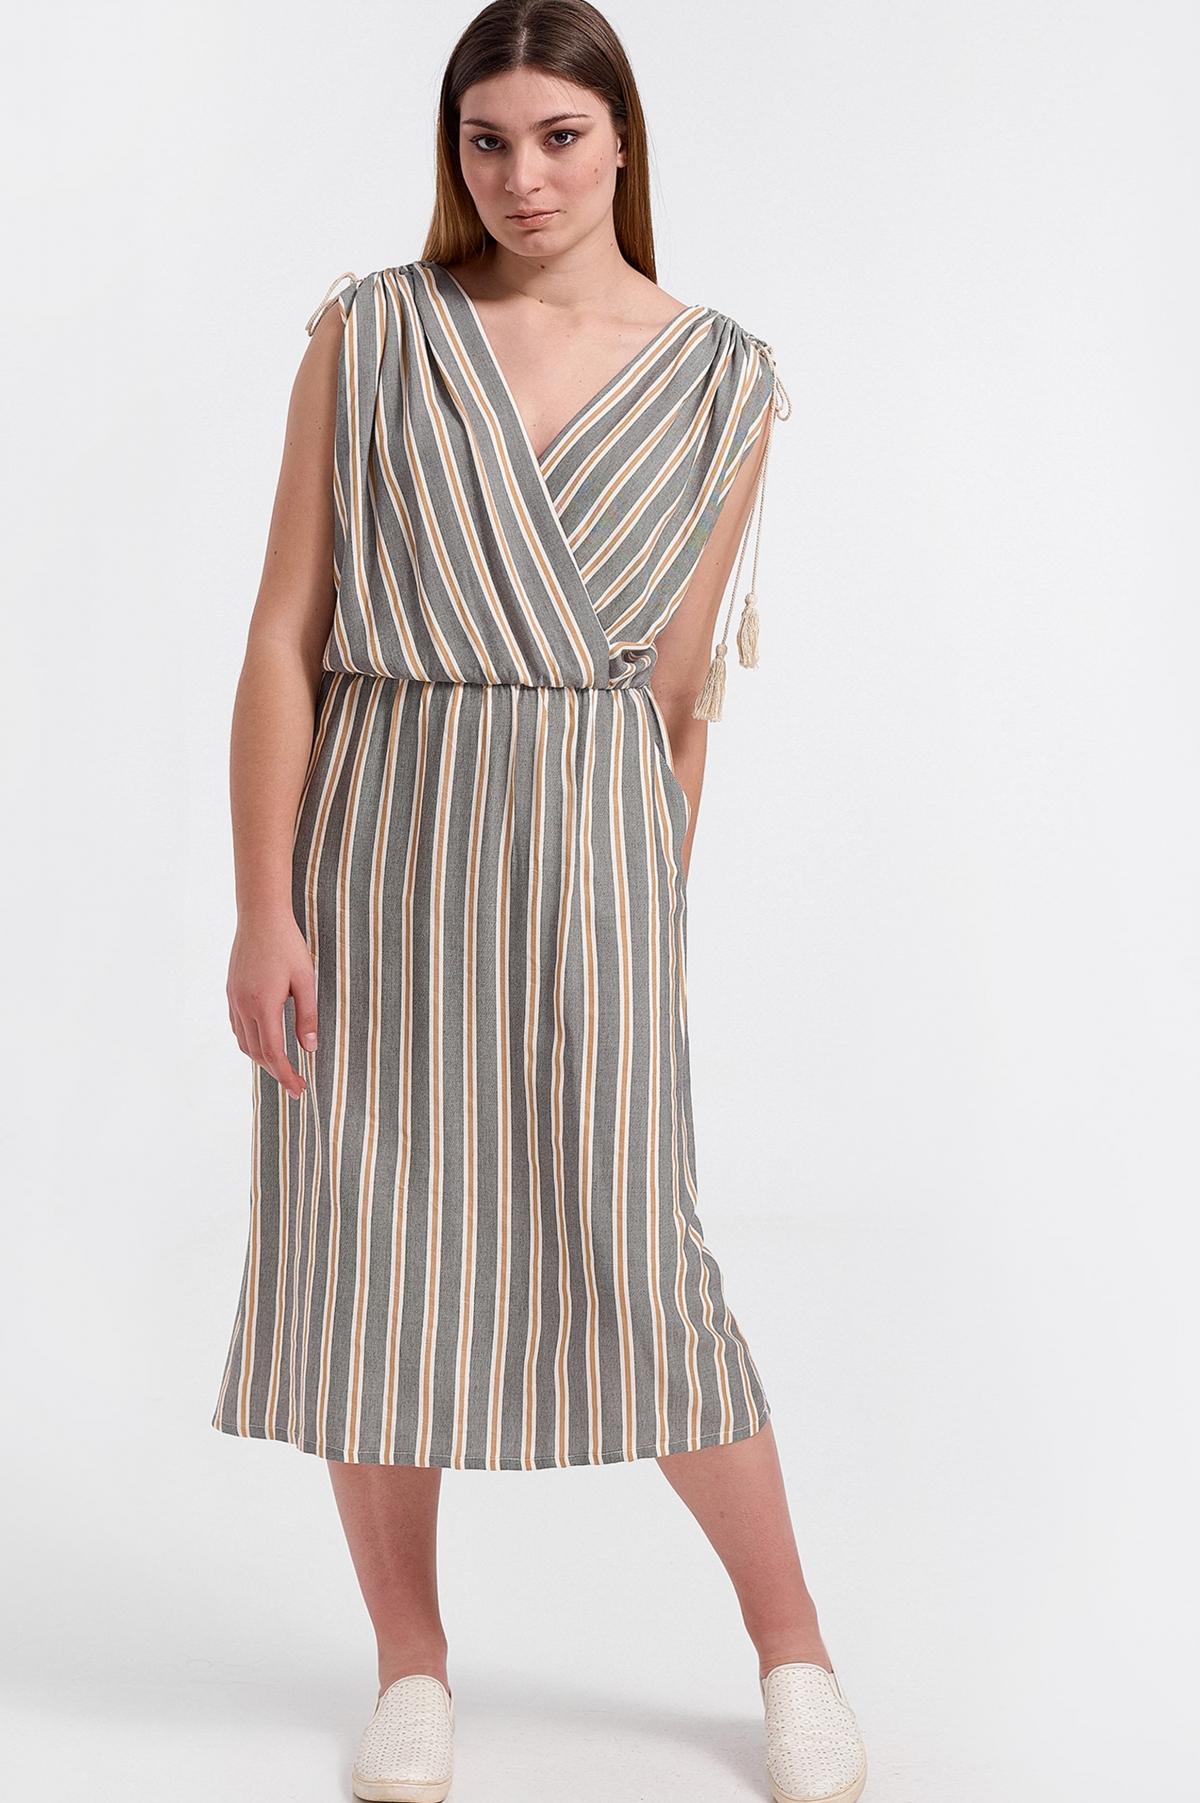 bae14f26d4c ΦΟΡΕΜΑ ΡΙΓΕ - Real Lady - Shop Online